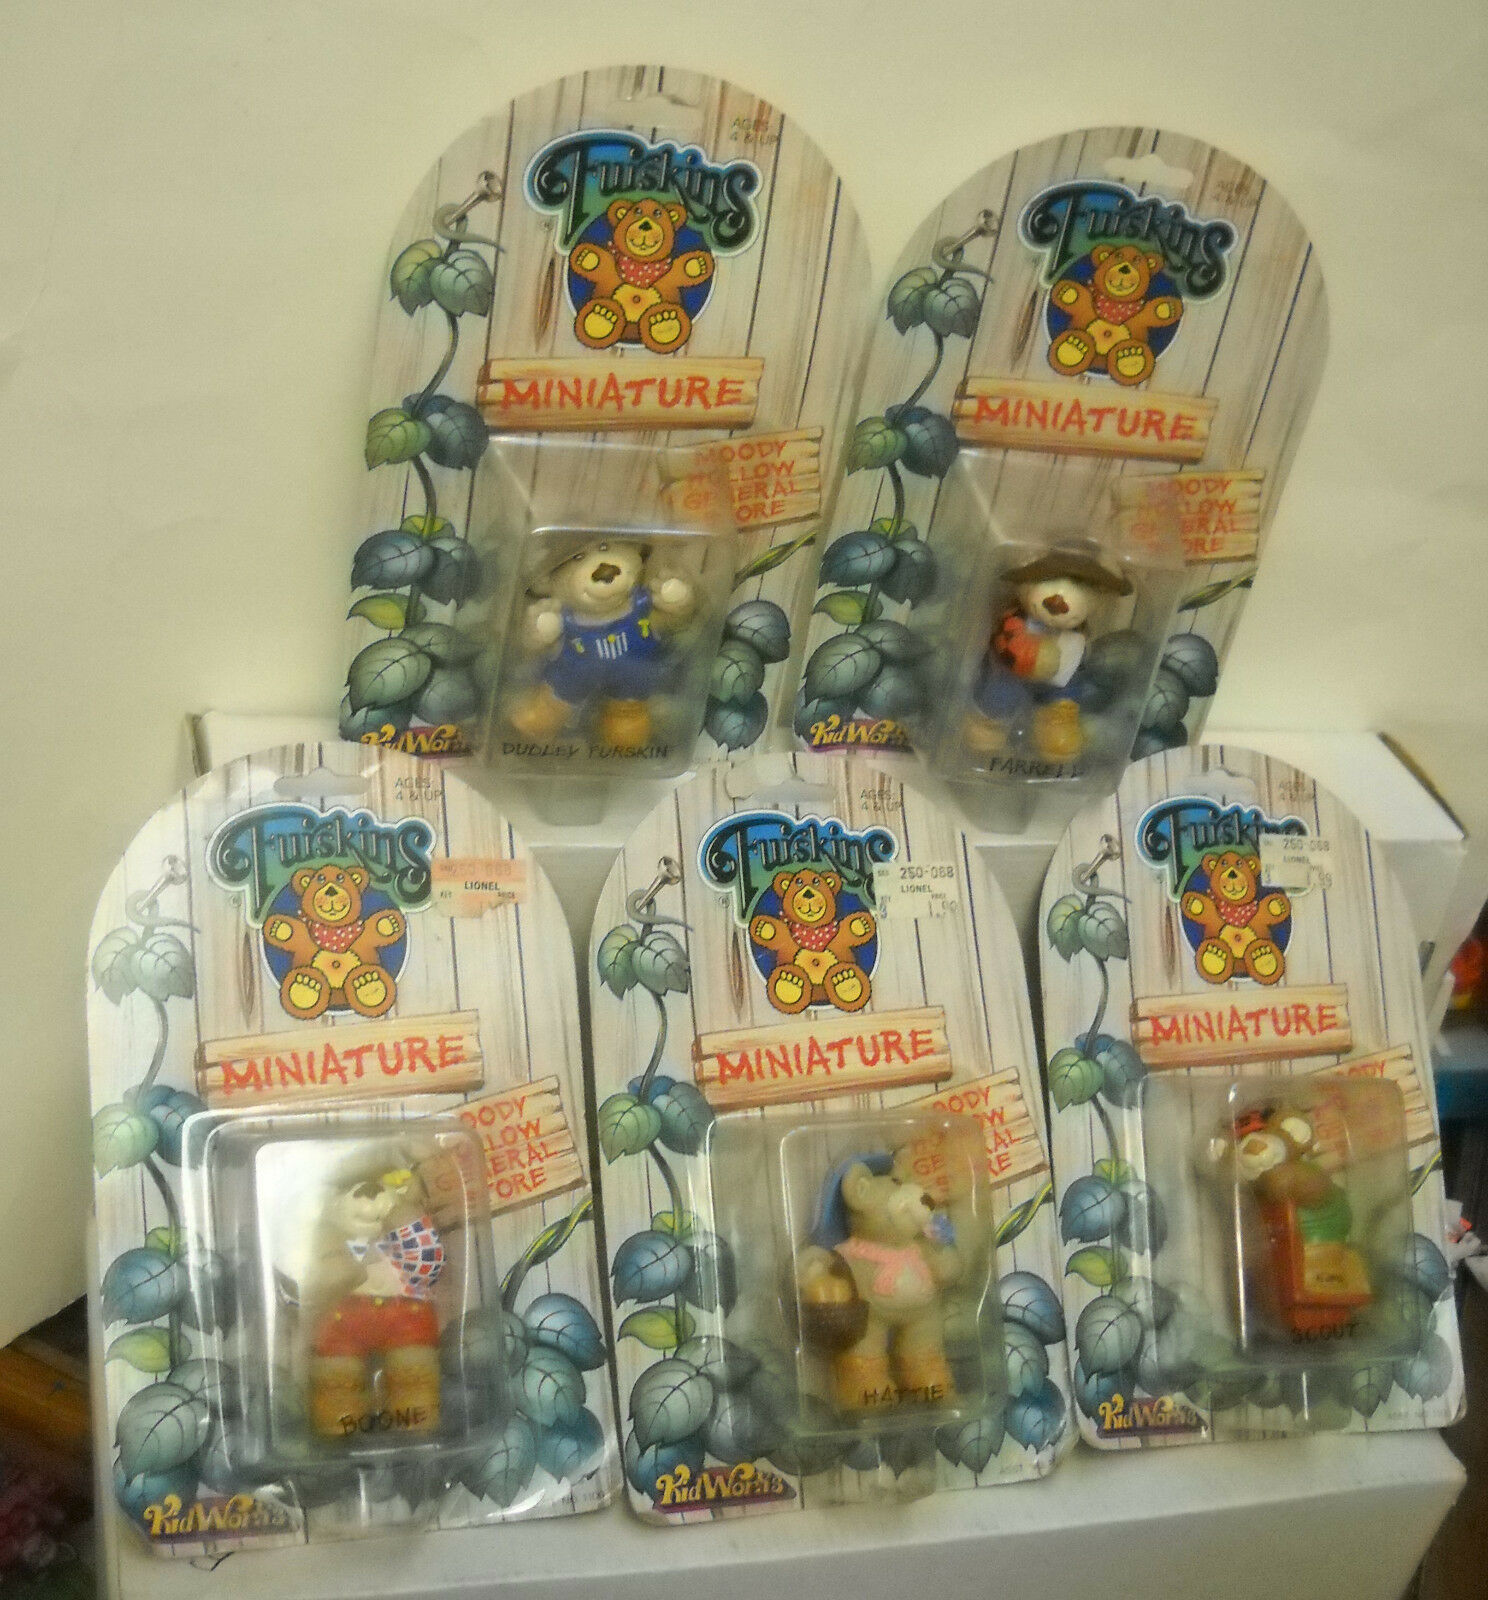 7726 NRFC Vintage Kidworks 5 Furskins Miniature Bear Collectibles